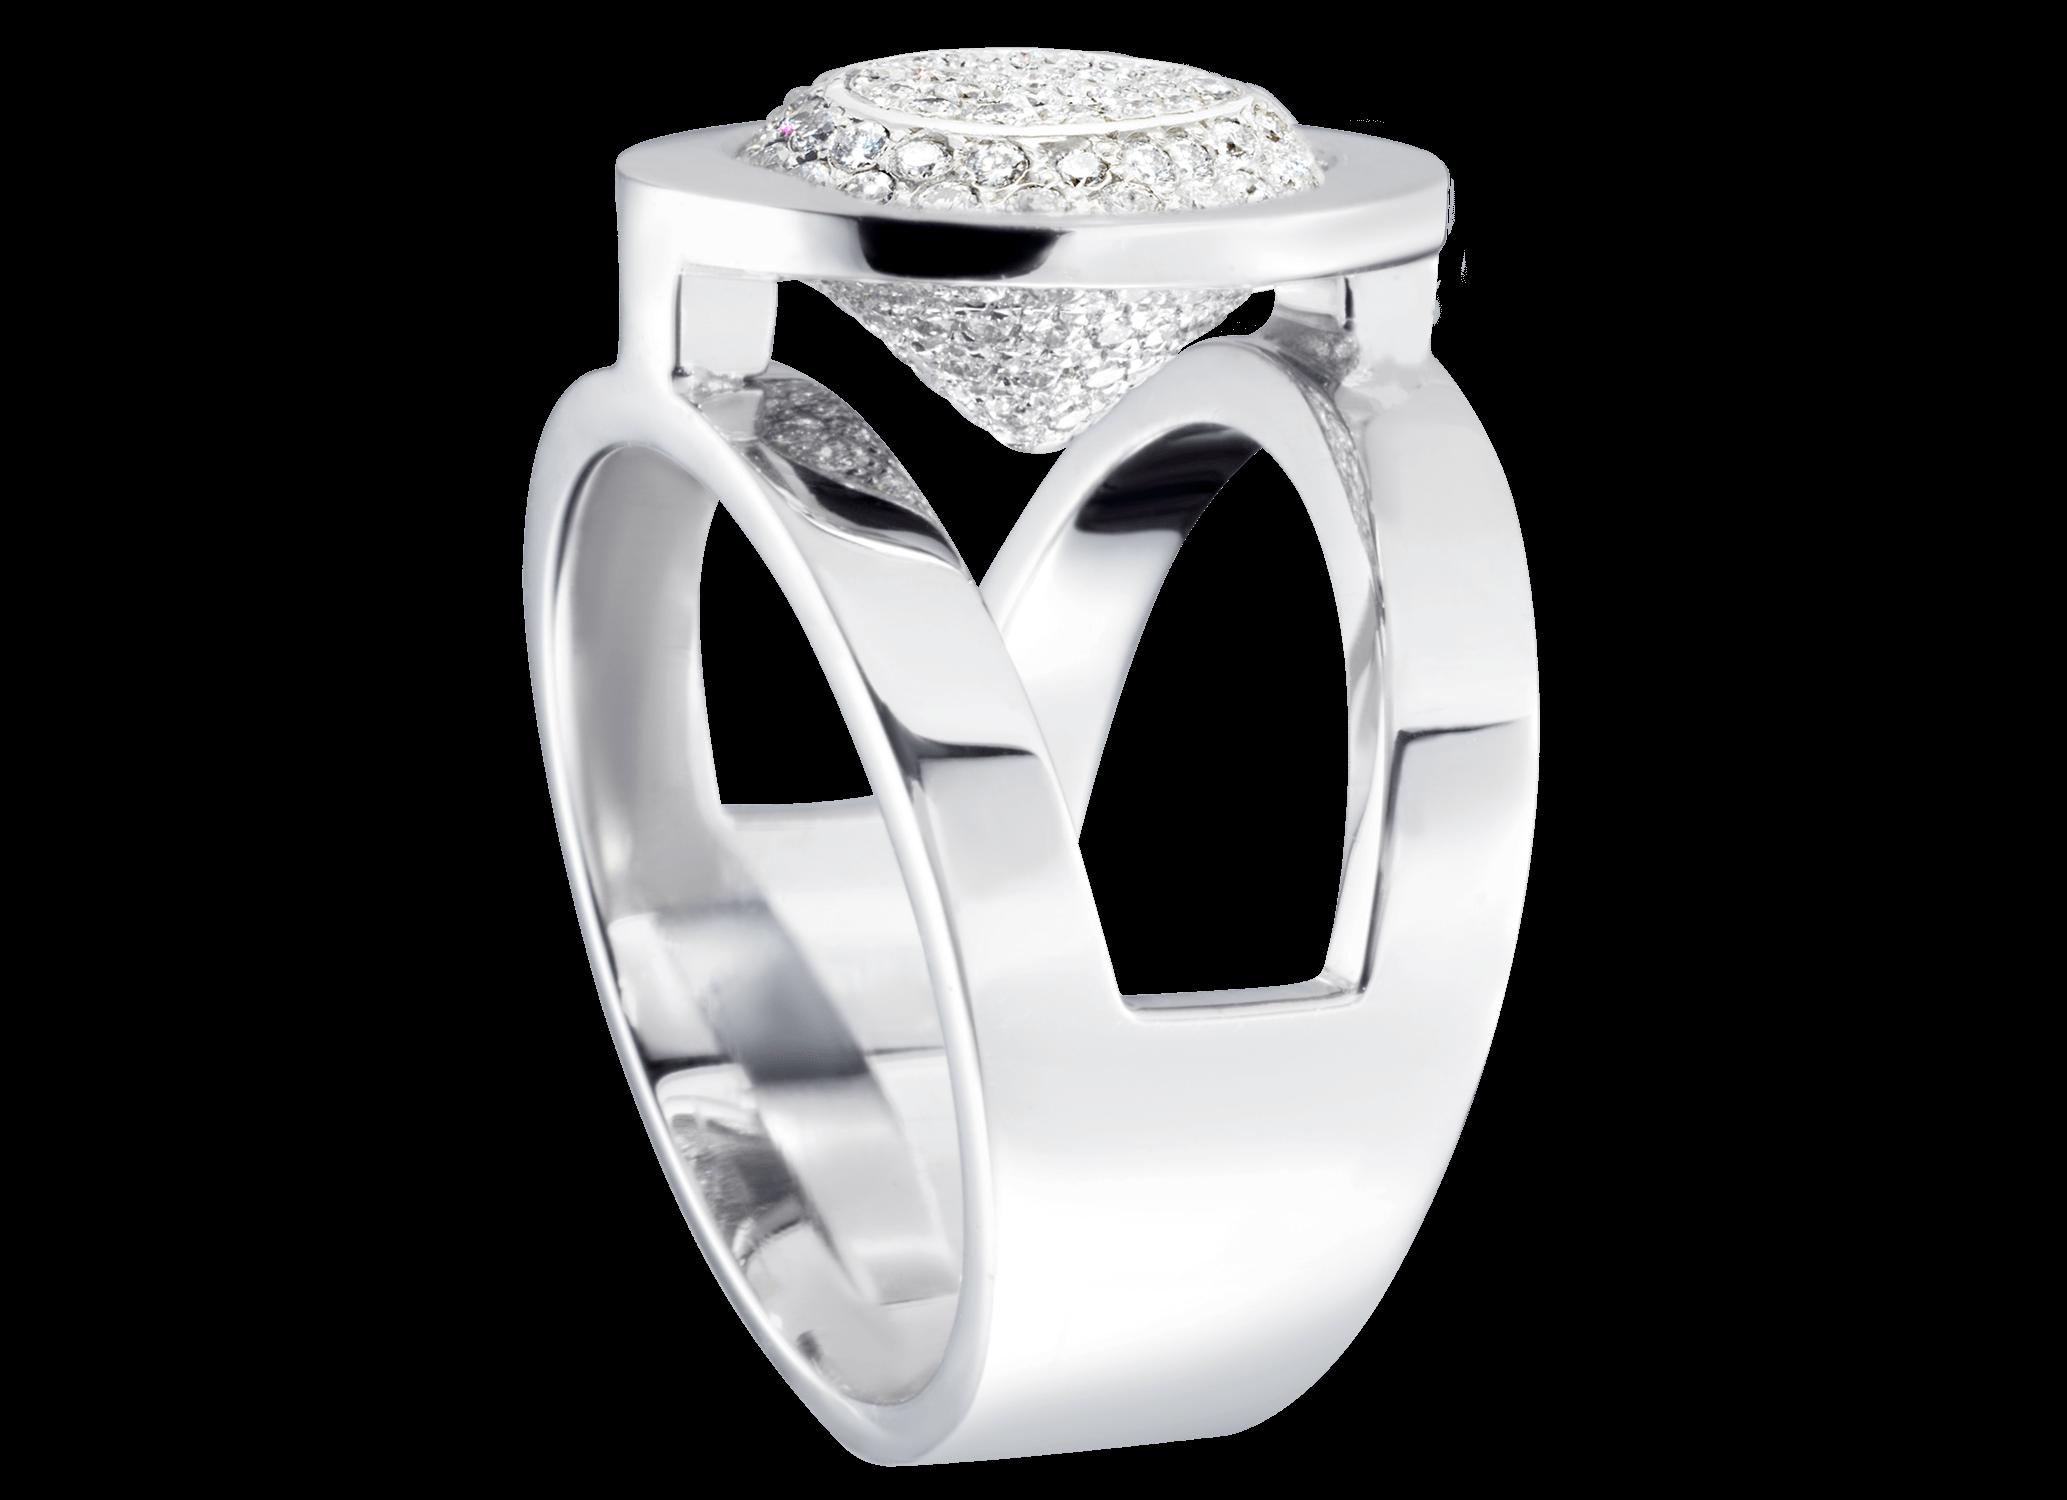 Bague Mamona - Or blanc et pavage 125 diamants 0,65 carat4 900 €